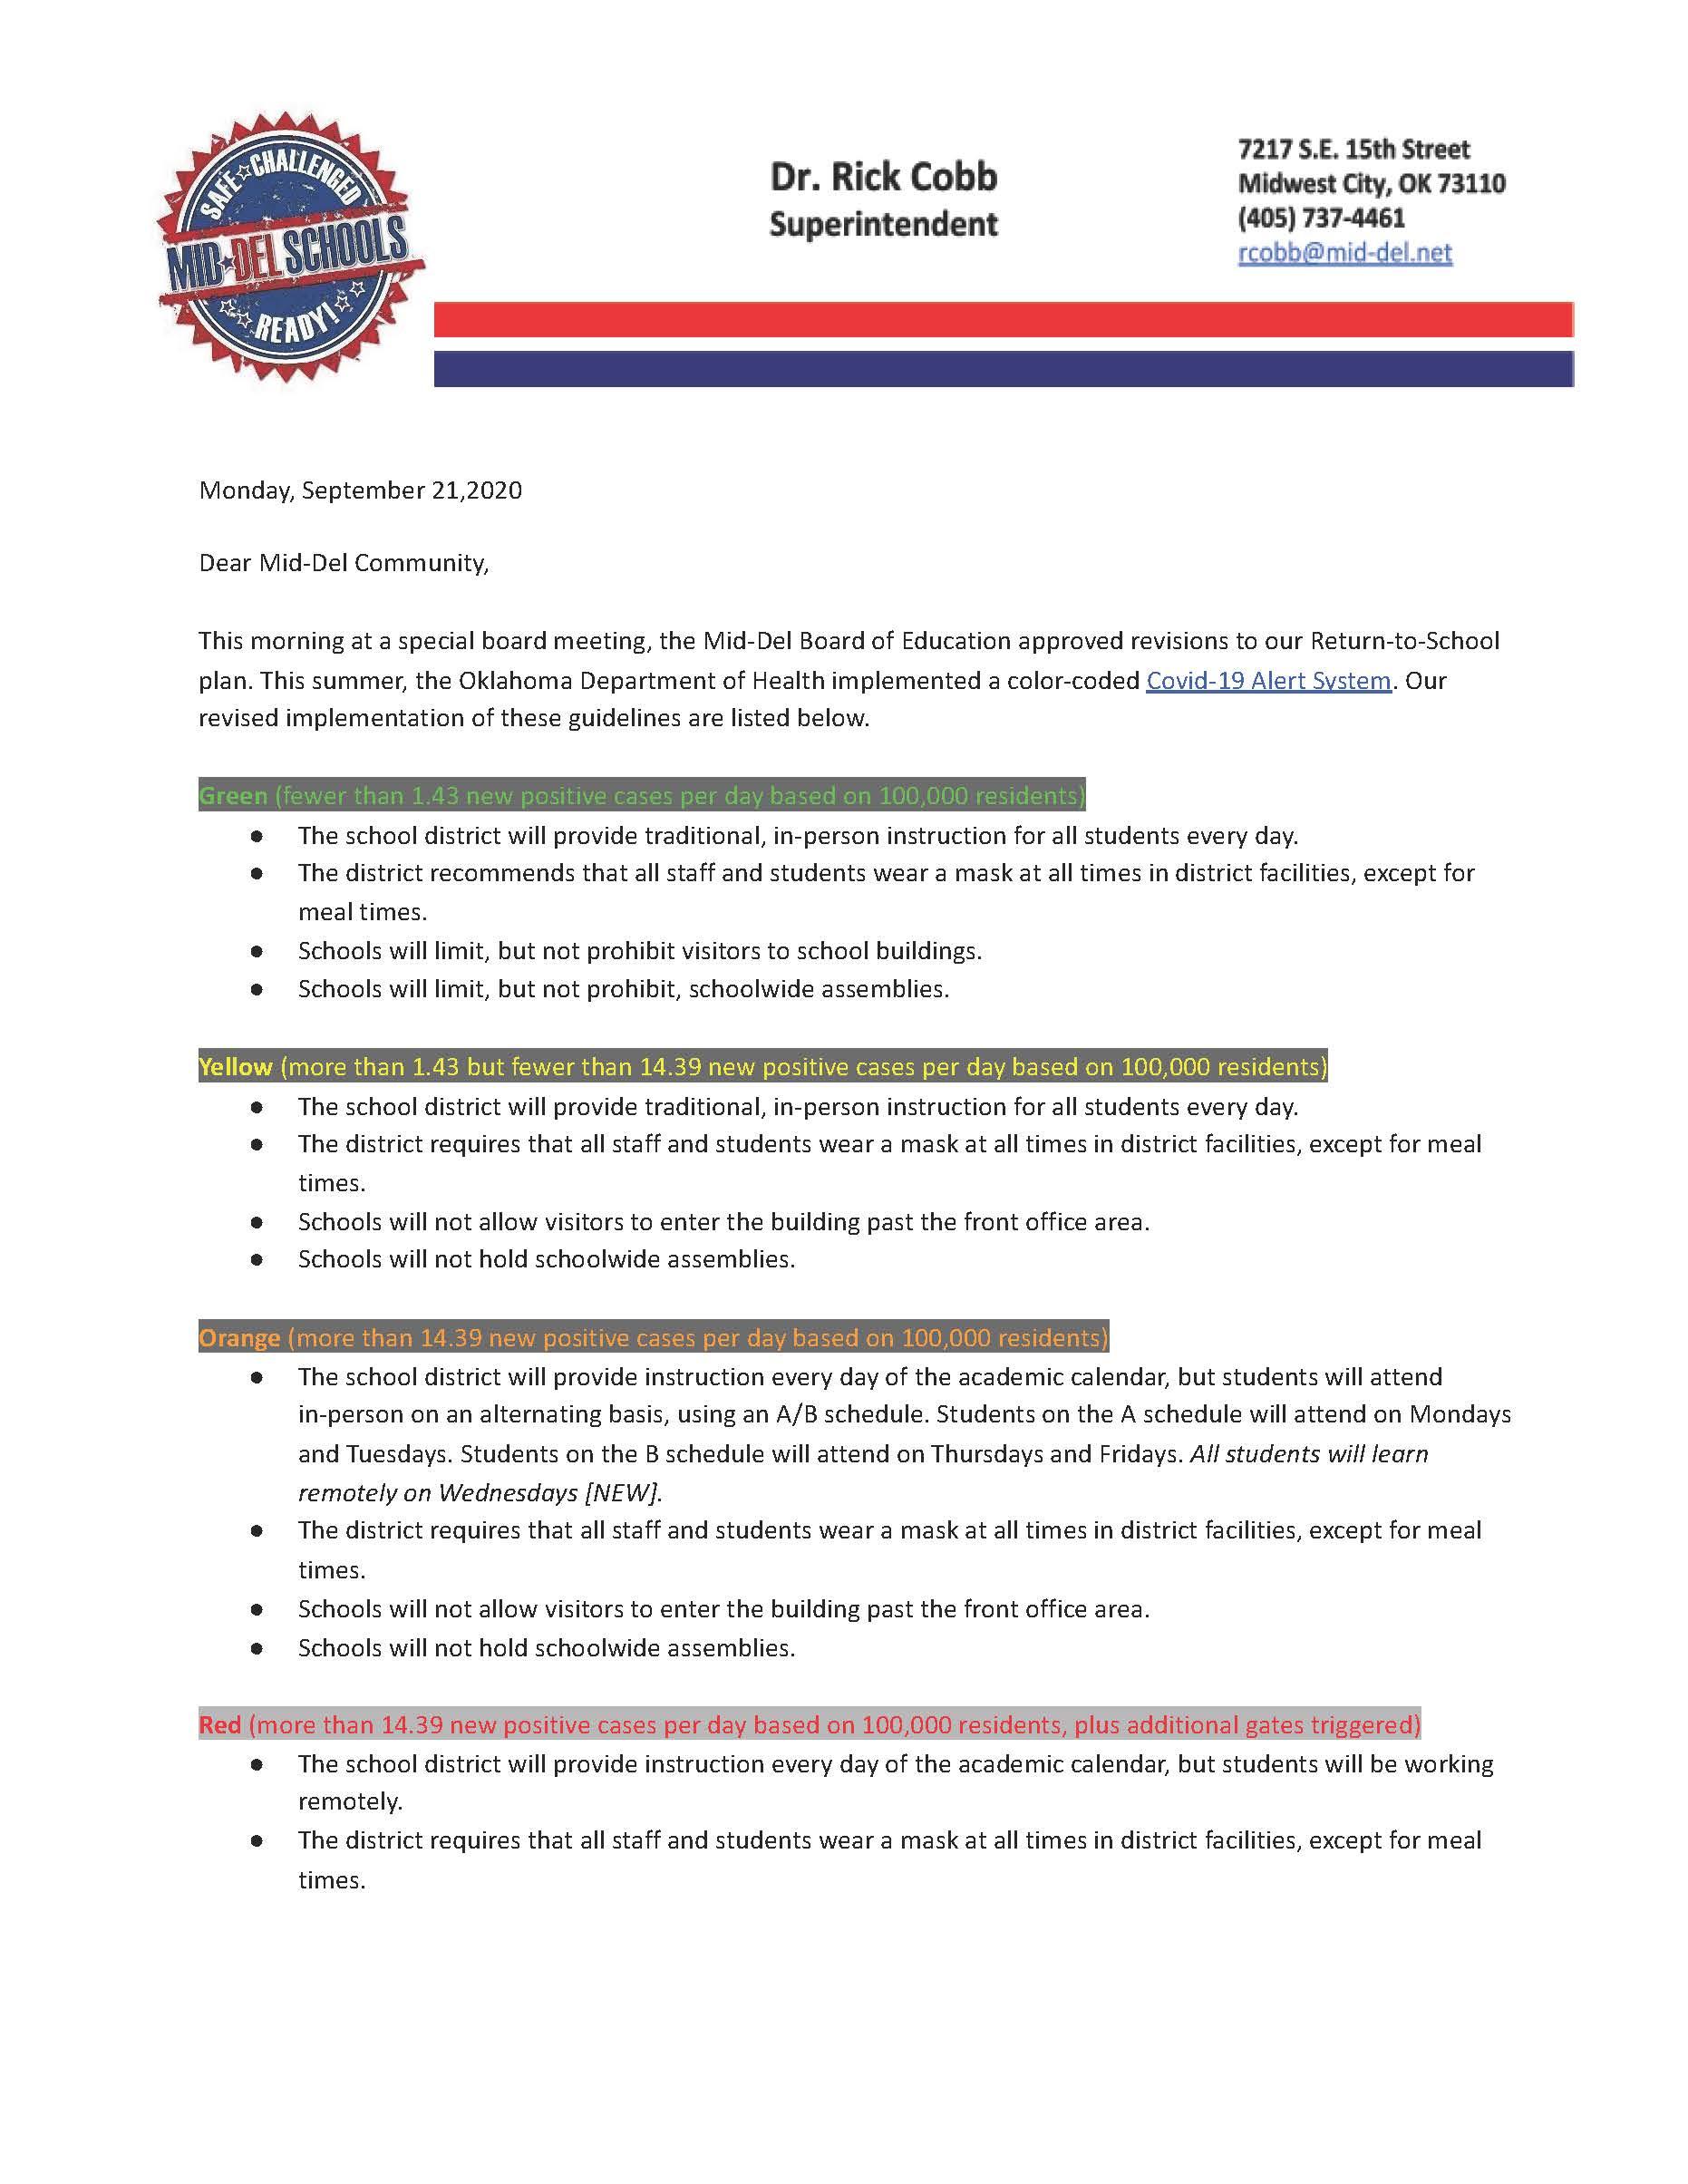 Dr. Cobb's letter 9-21-2020 Update